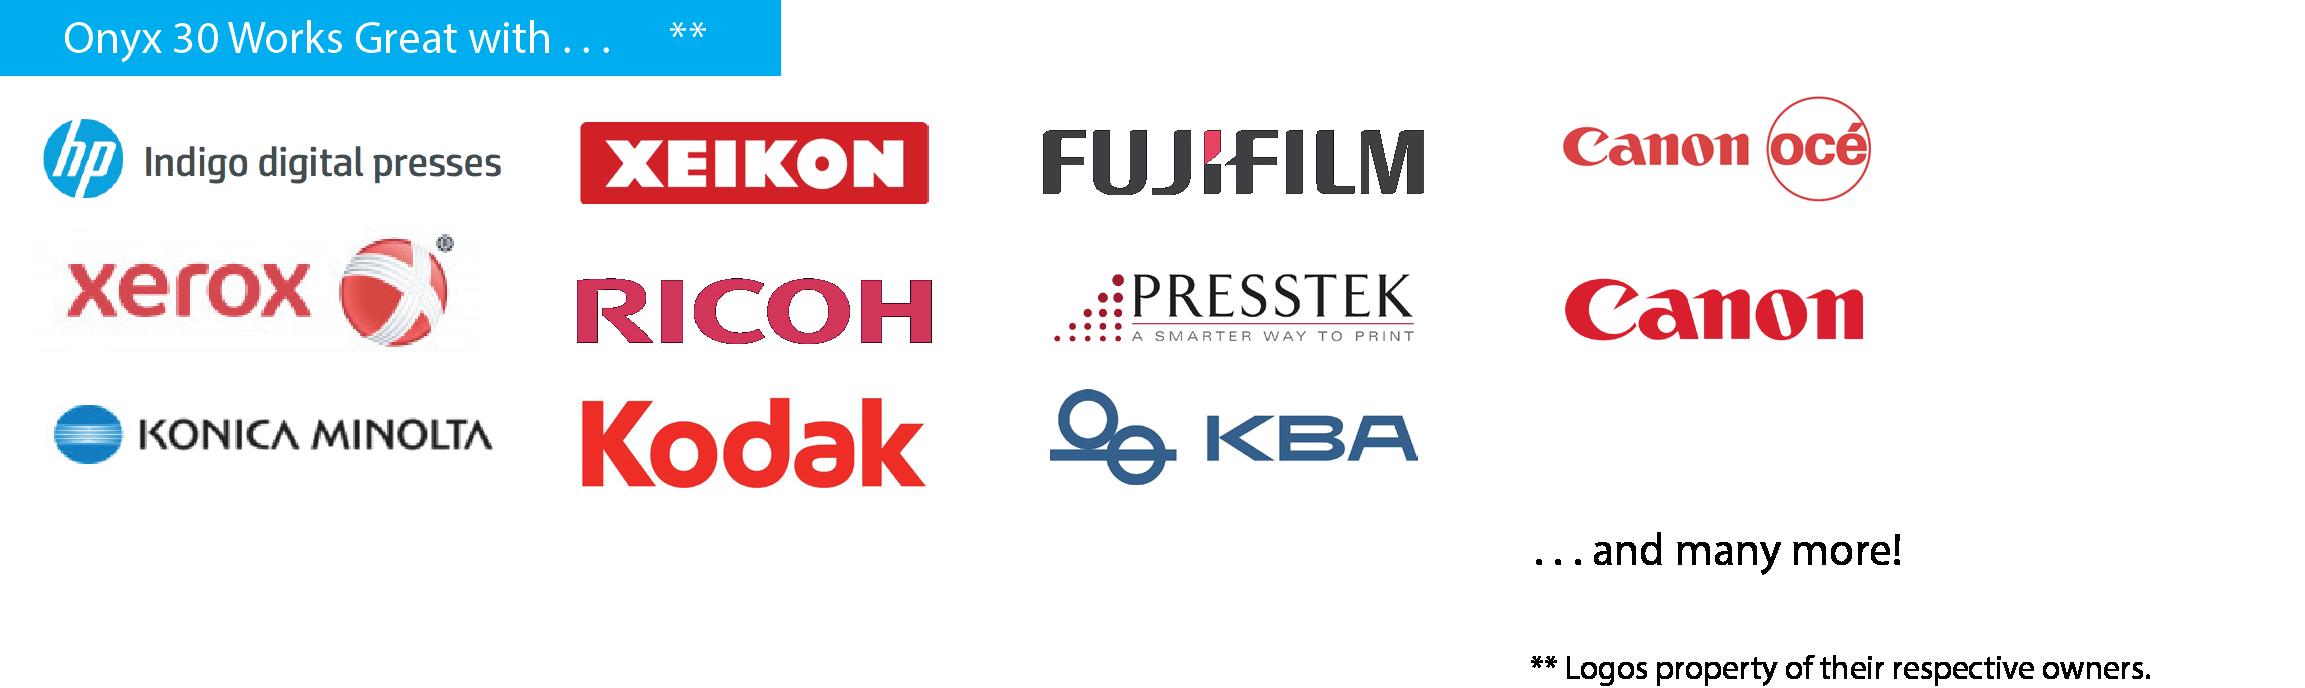 Kompac_Compatibility_HP_Xerox_Canon_Fuji_Xeikon_Konica_Minolta_Ricoh_Kodak_Presstek_Oce_Onyx_30.png